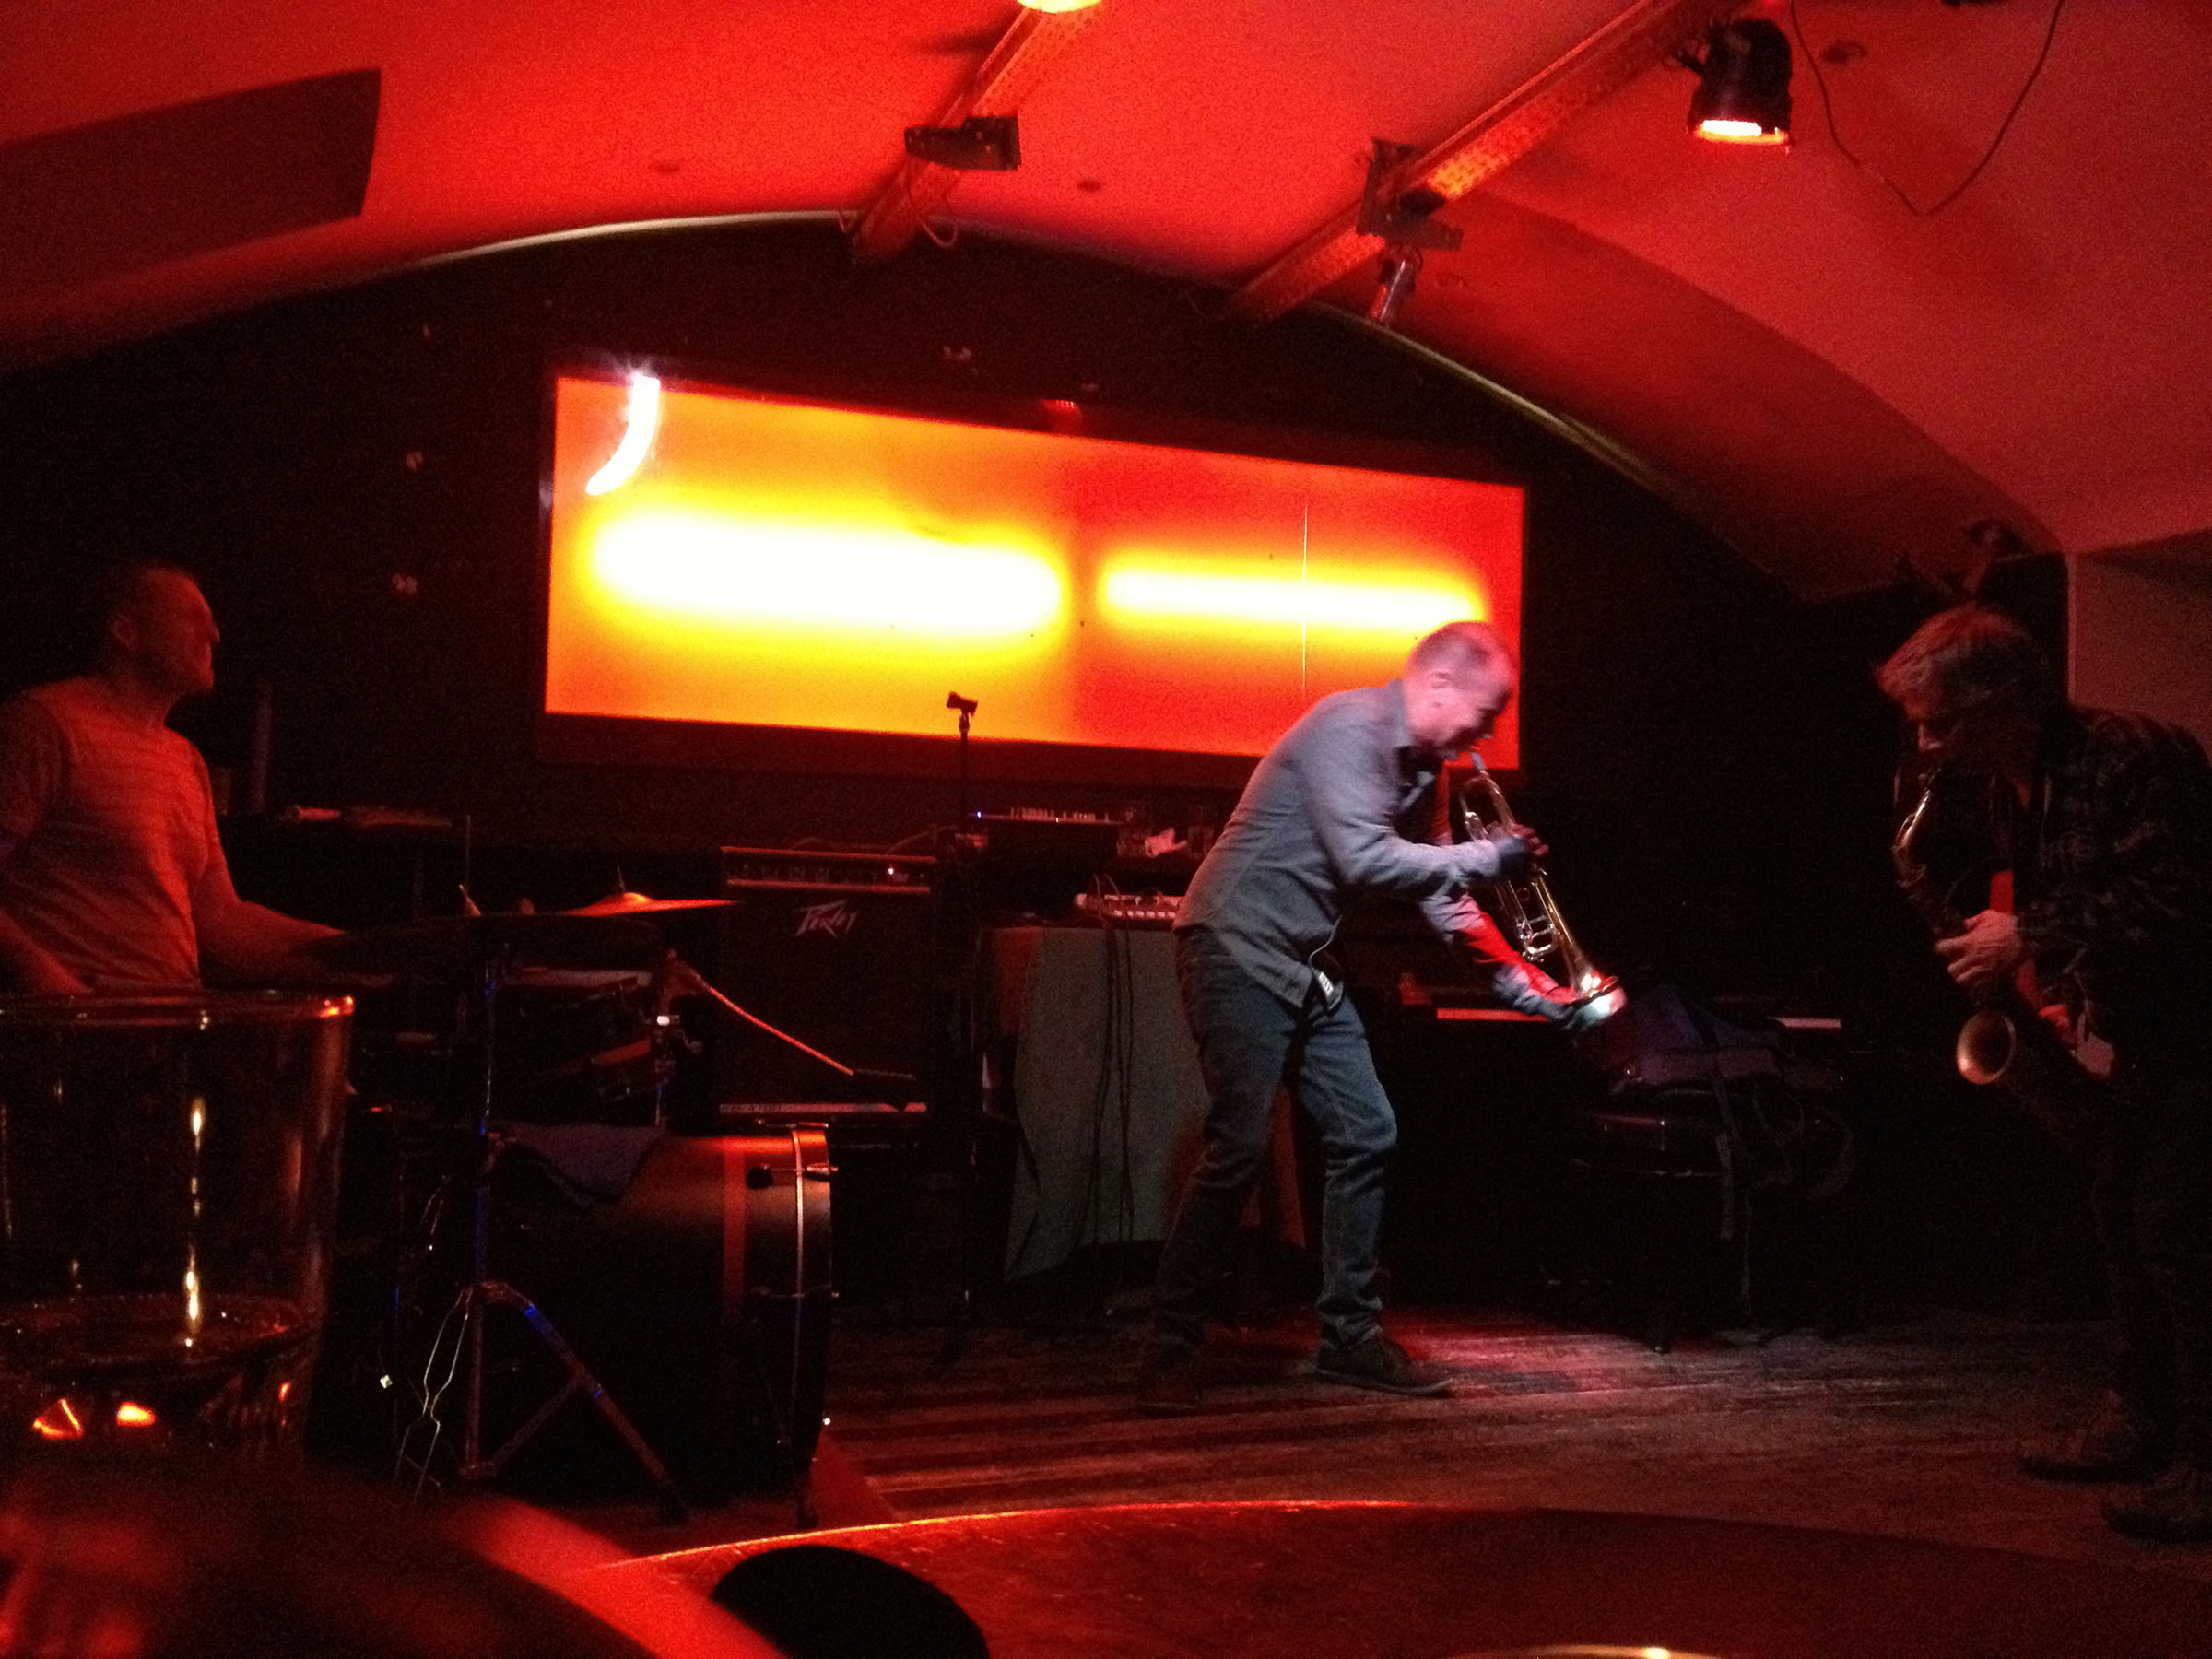 At Celeste in Vienna, Austria with Uli Soyka and Marco Eneidi